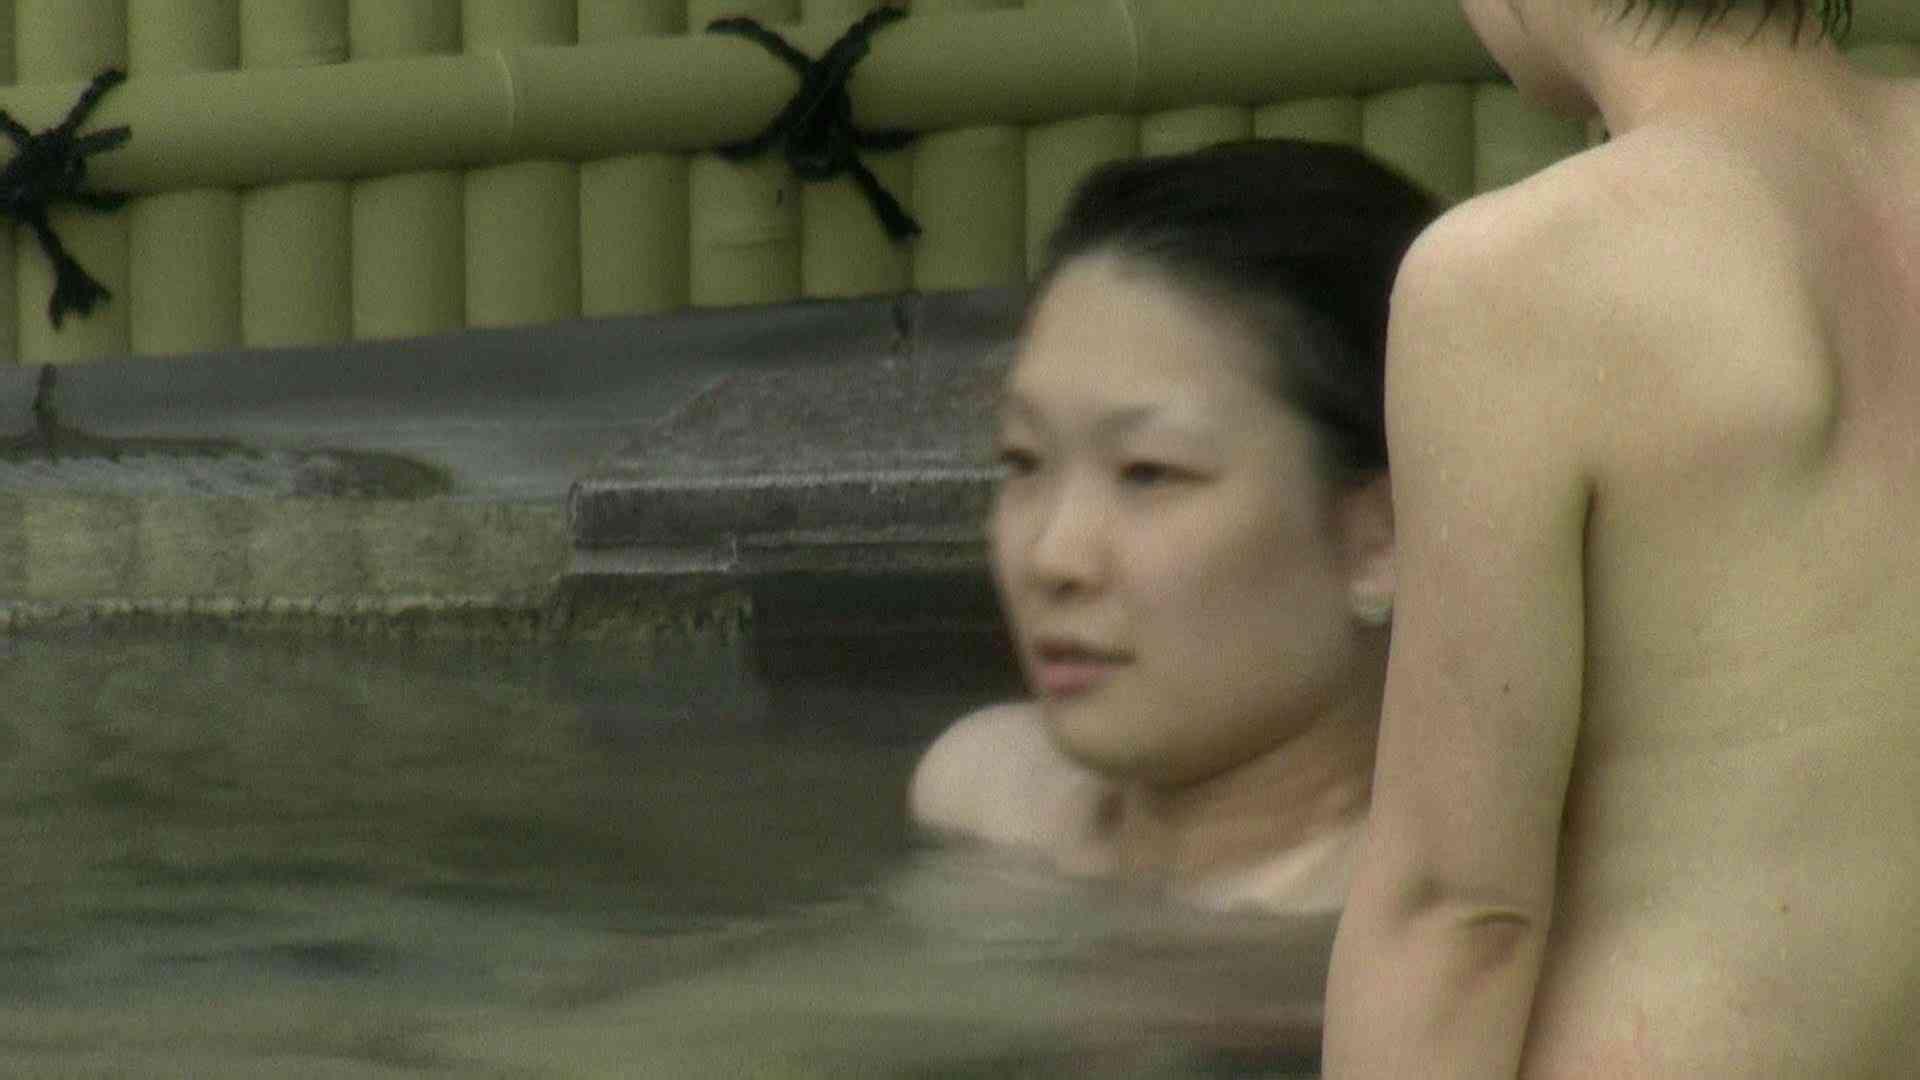 Aquaな露天風呂Vol.670 0 | 0  81連発 61